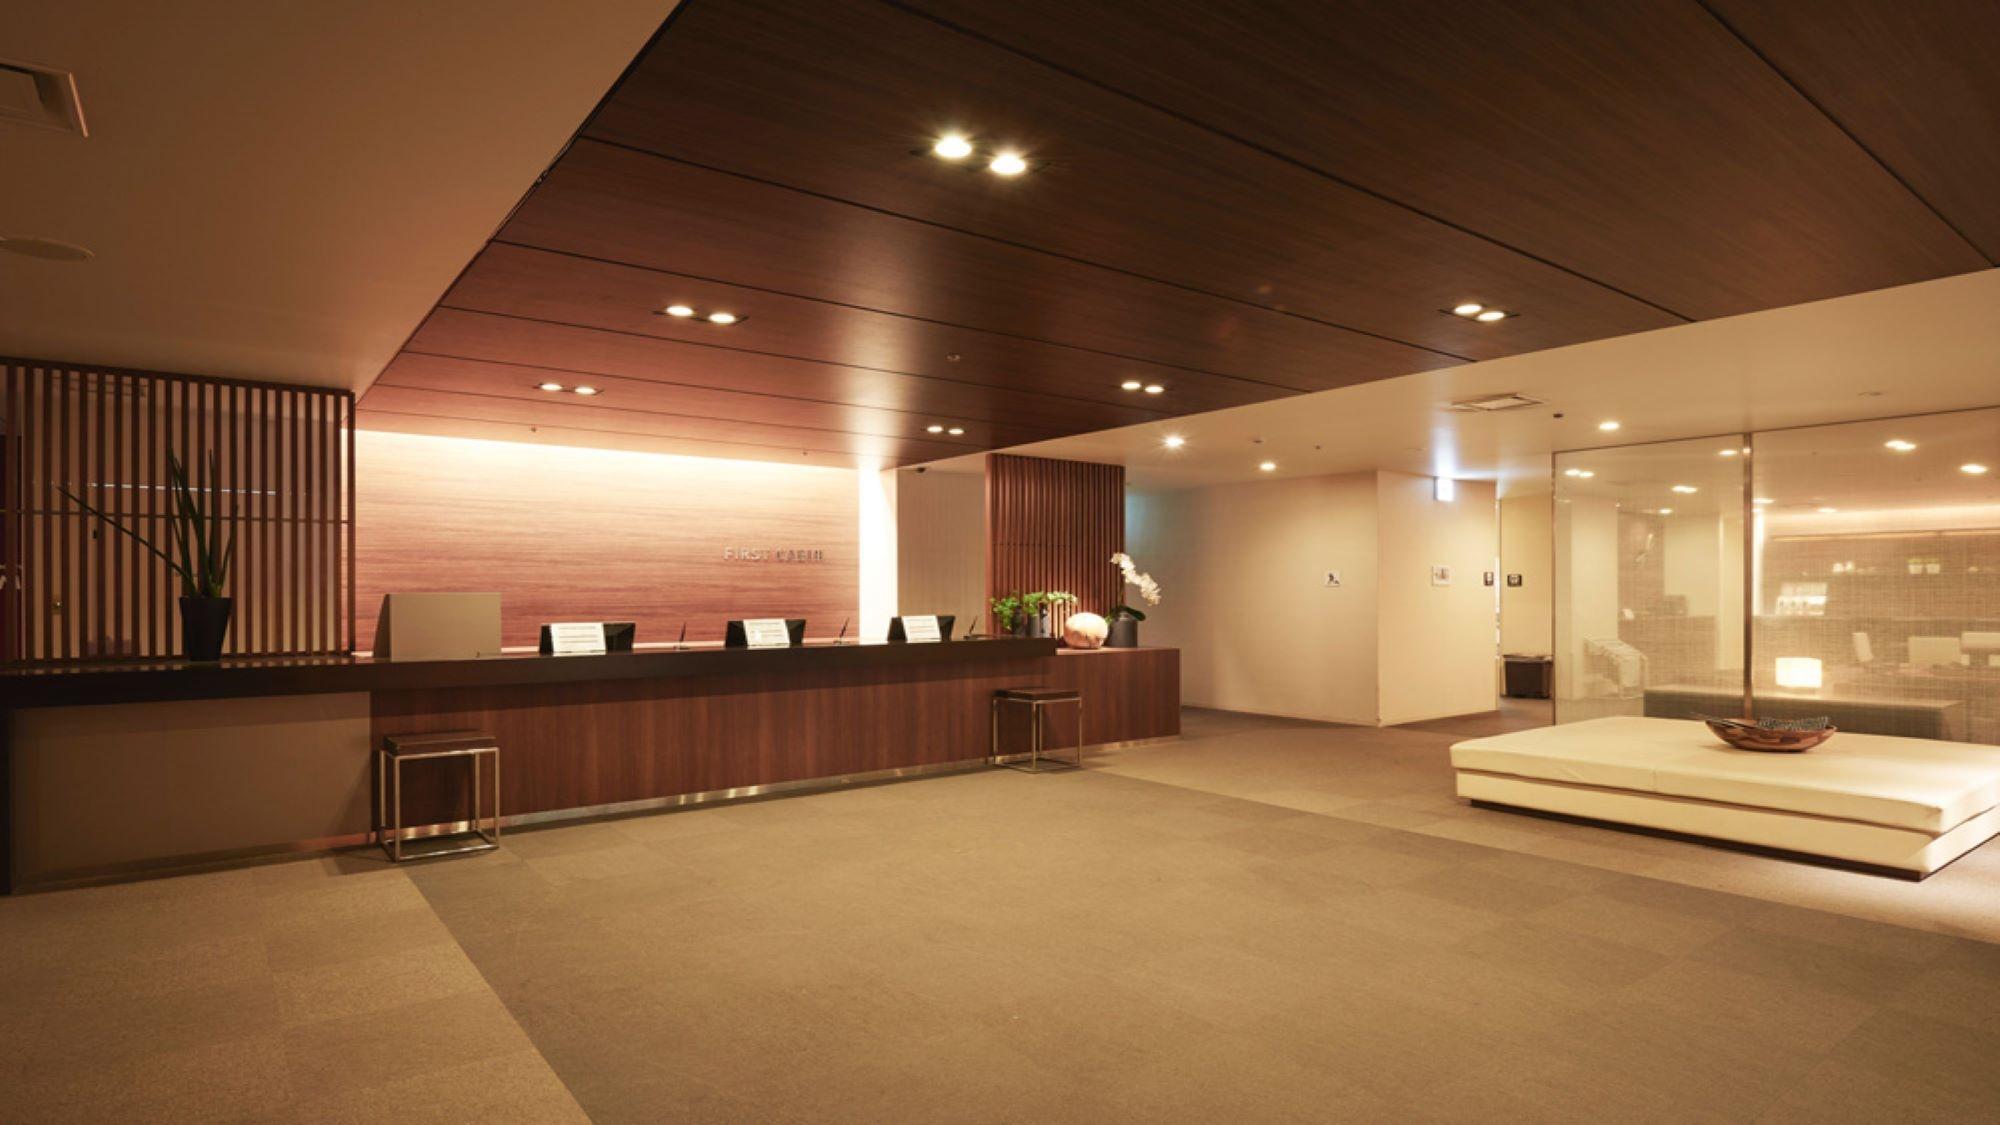 FIRST CABIN(ファーストキャビン) 羽田ターミナル1